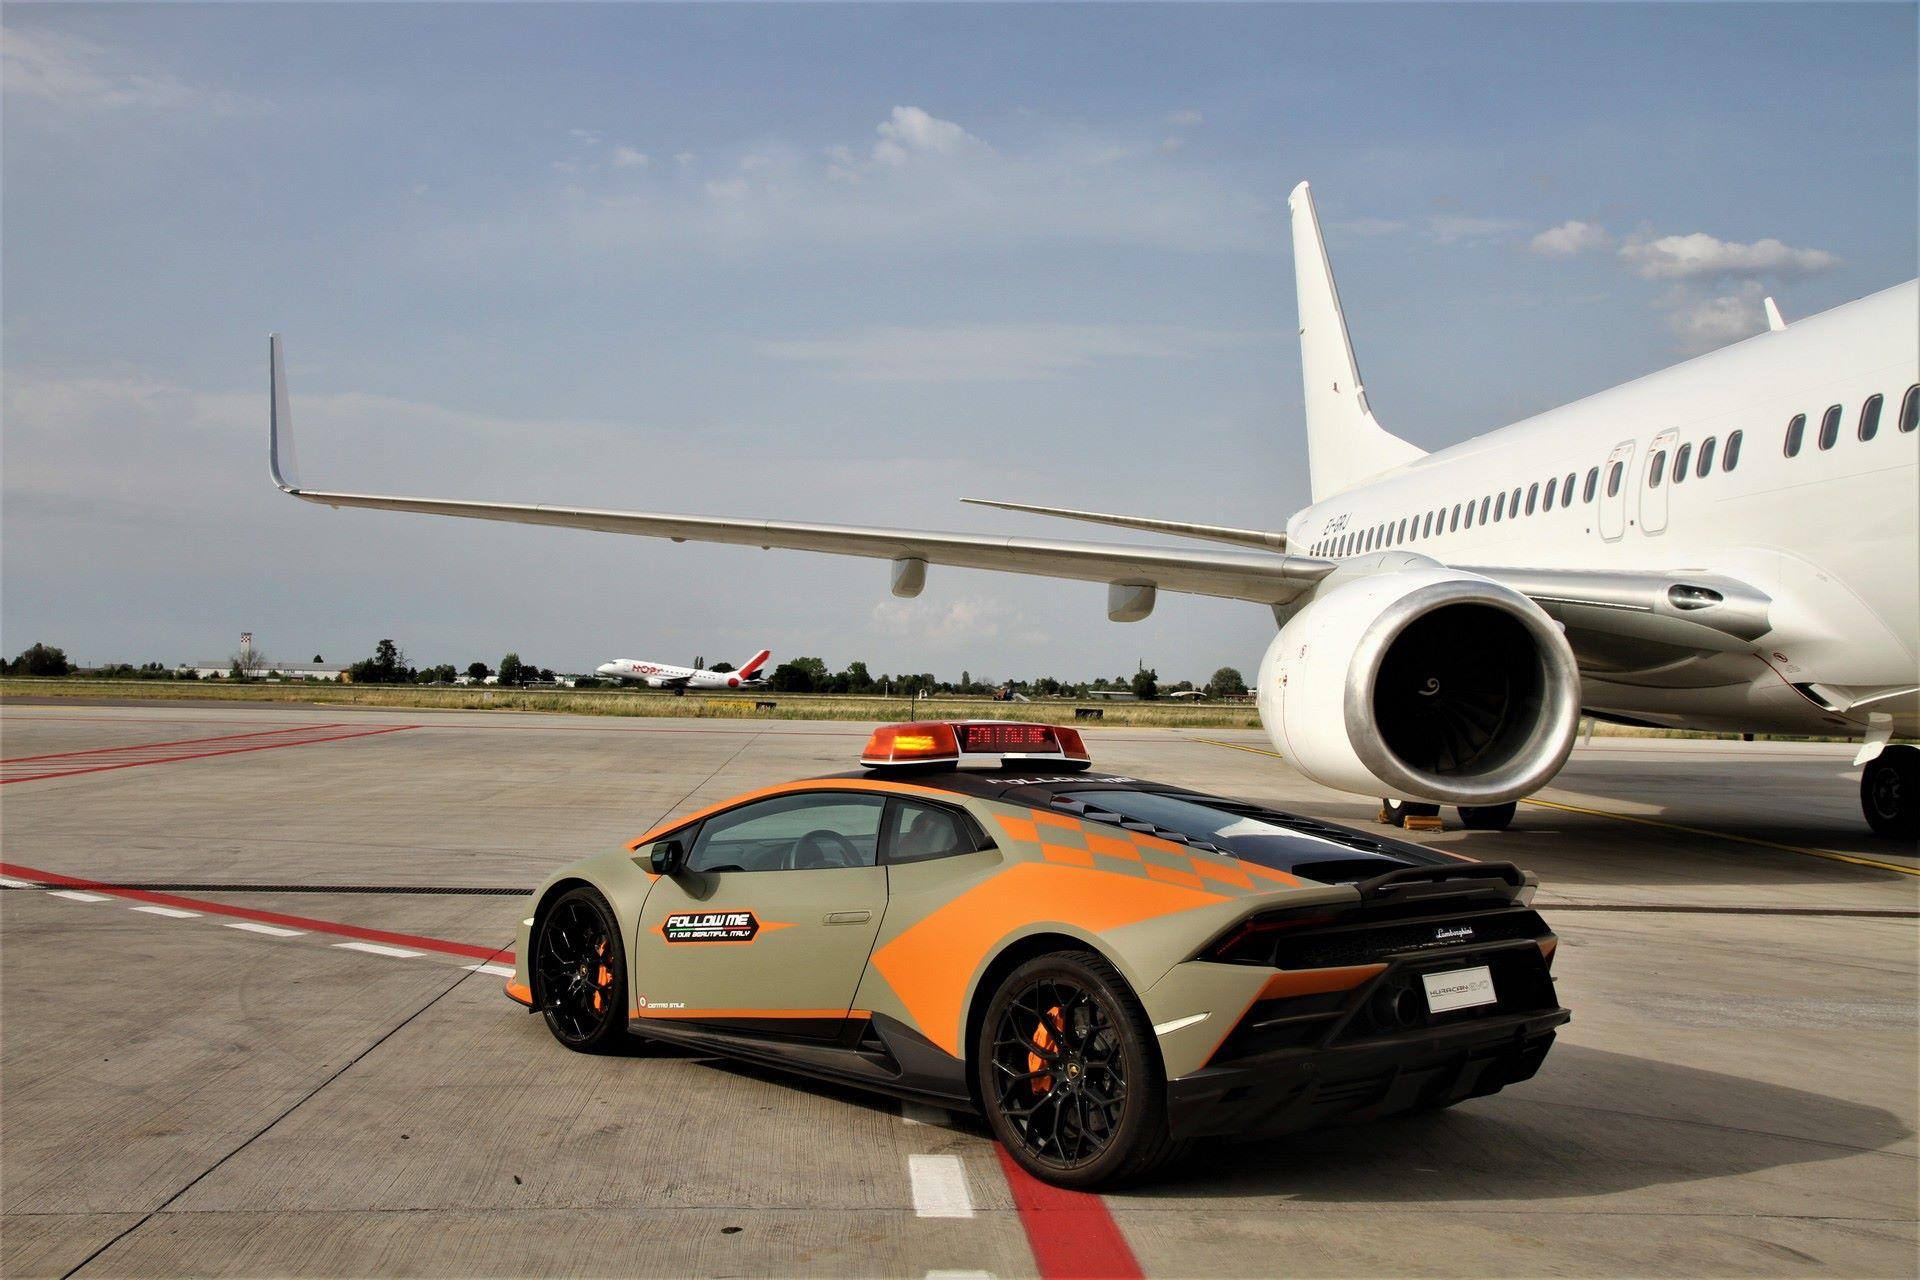 Lamborghini-Huracan-Evo-Follow-Me-bologna-airport-2021-14